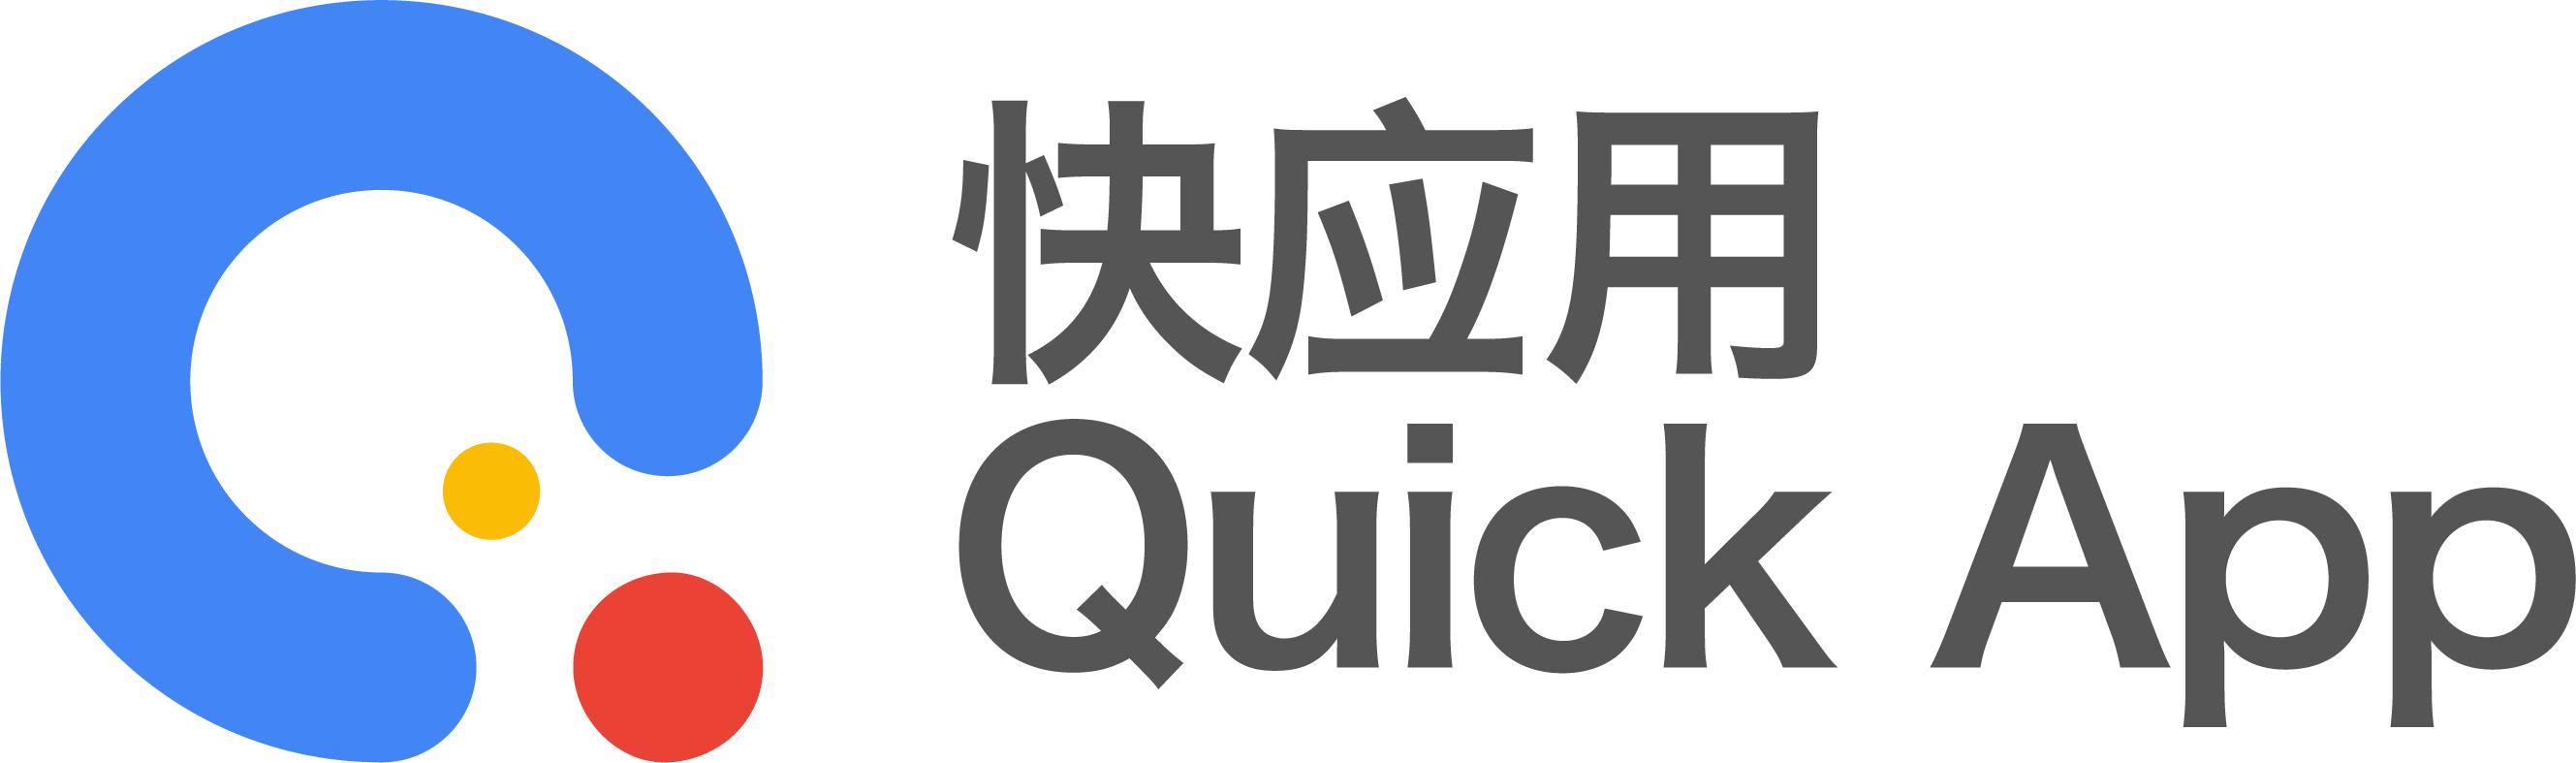 """Quick App""からのプッシュ通知をオフにする方法、無効化は非推奨"